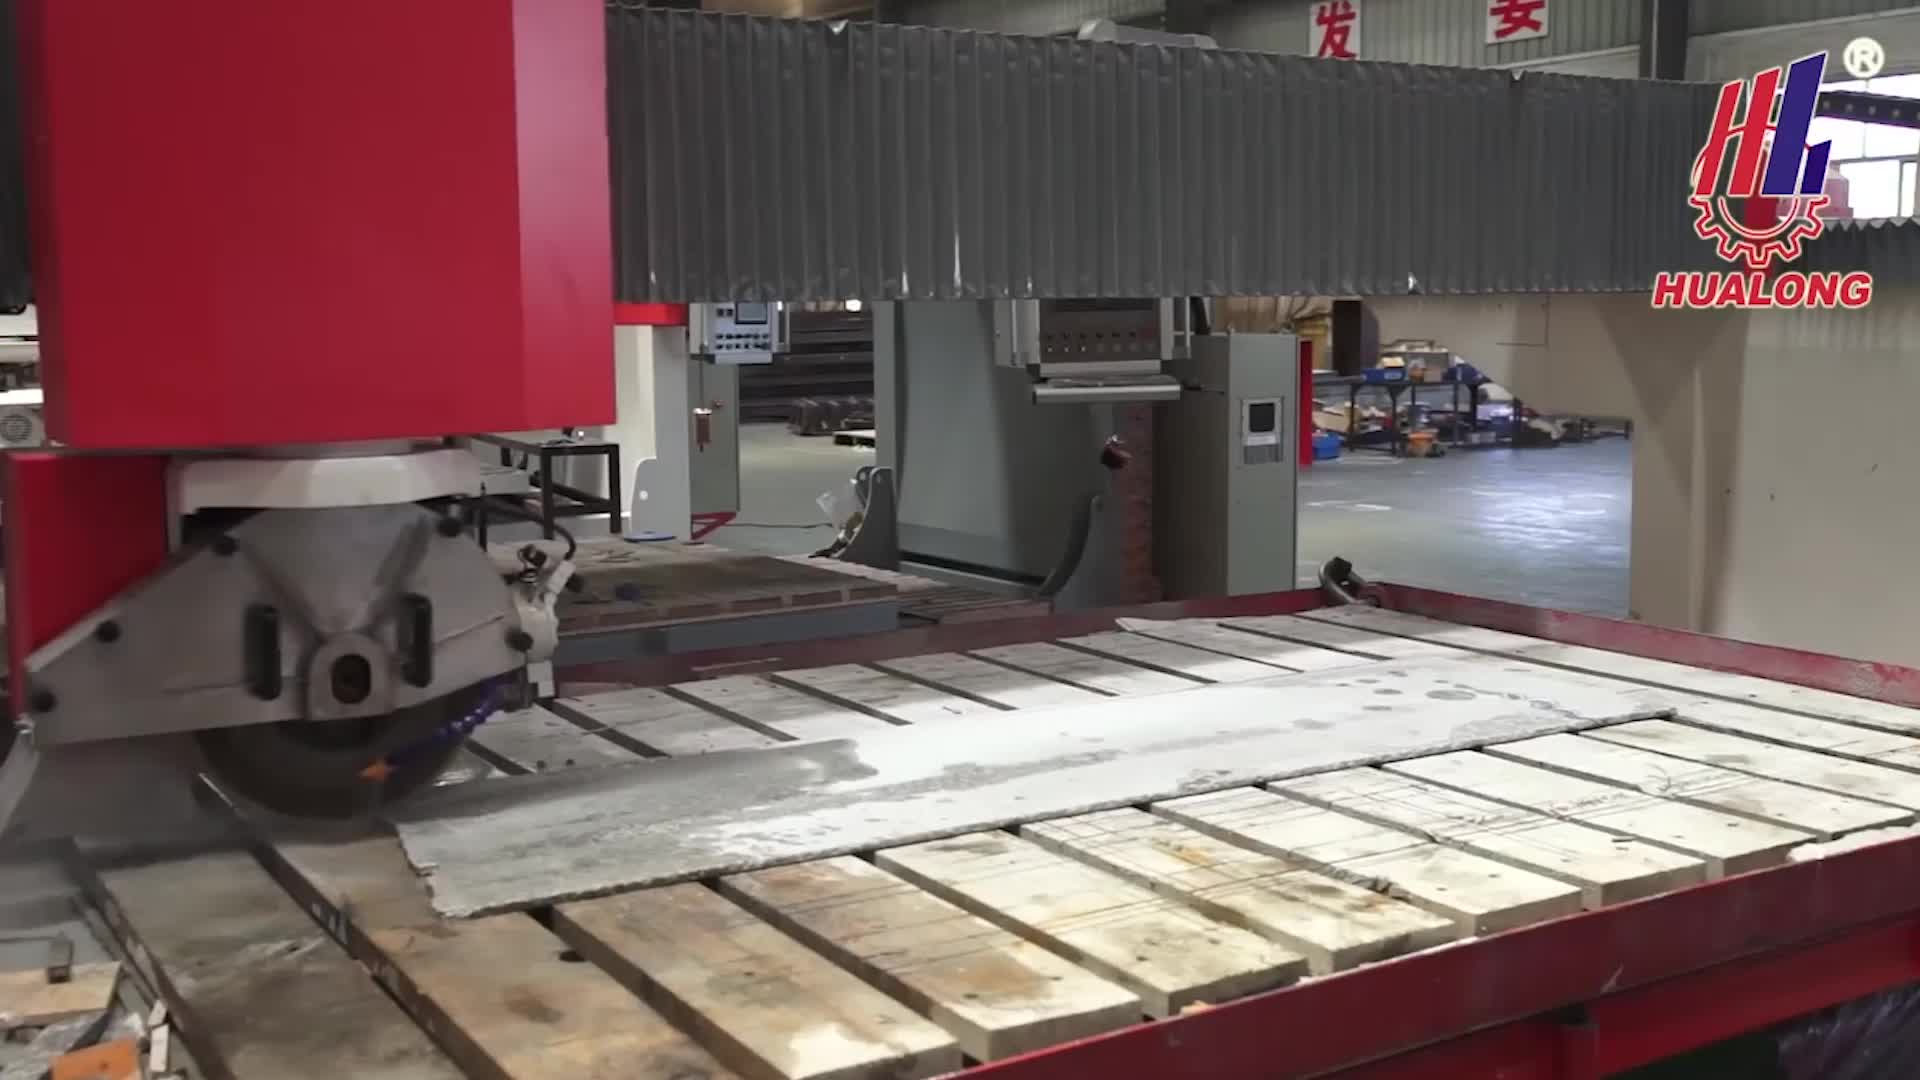 HUALONG stone machinery HSNC-500 countertop cutting saw Granite Slab Cutting Machine for granite marble quartz